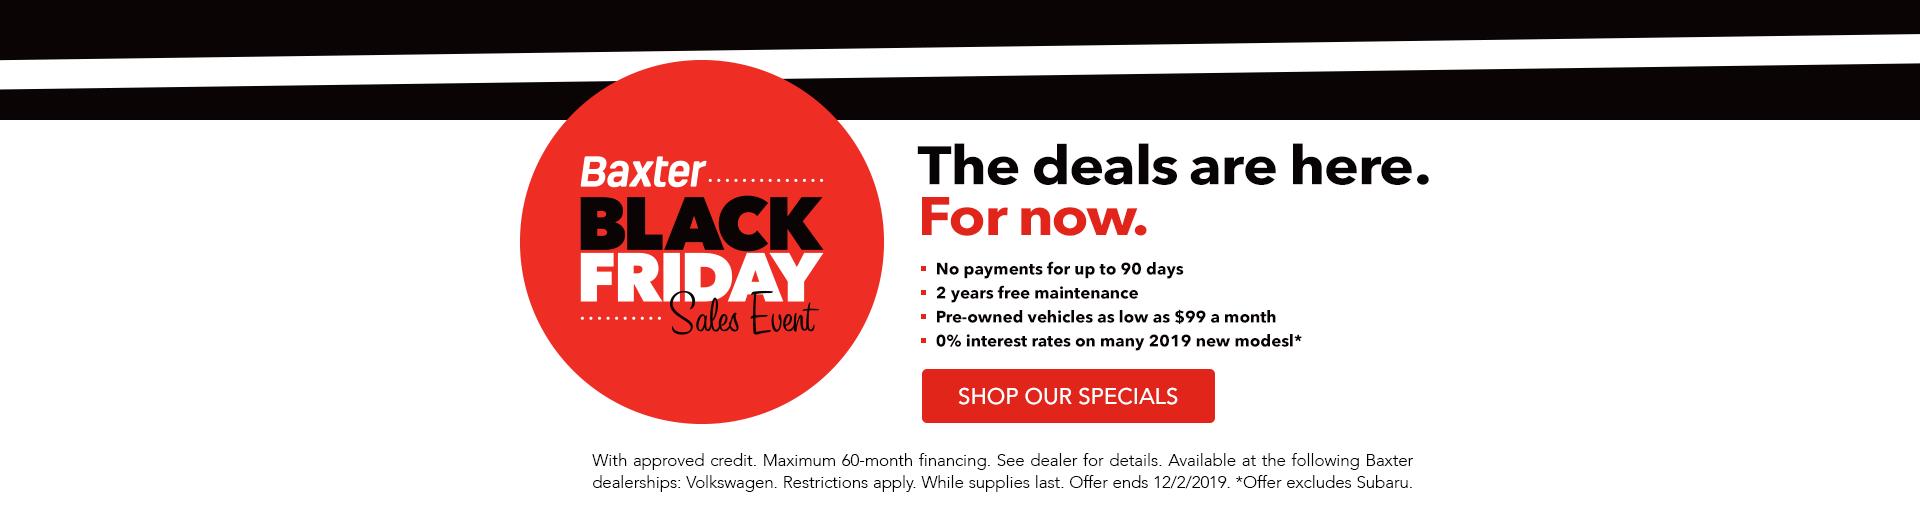 Baxter Black Friday Sales Event